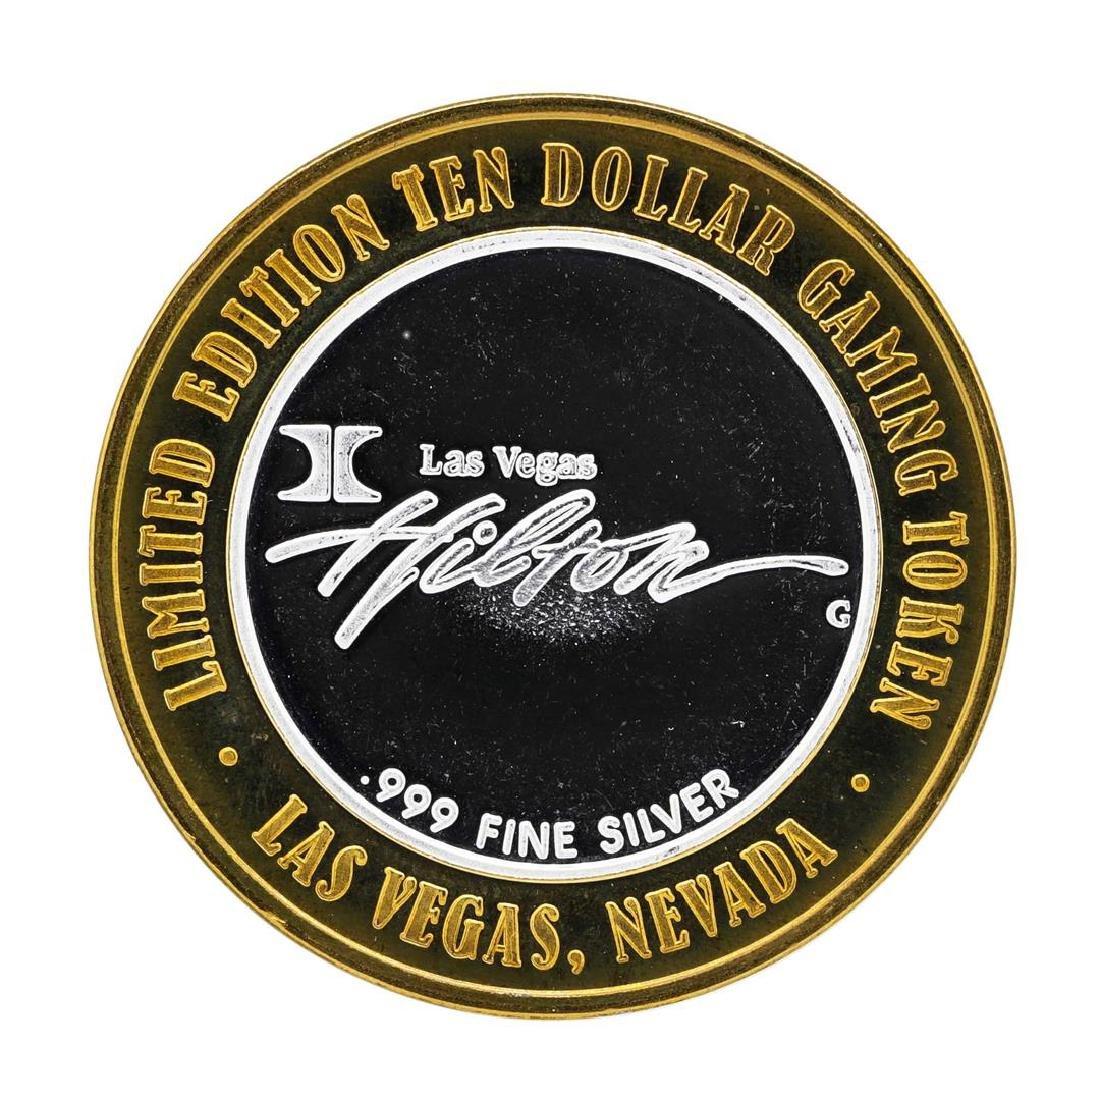 .999 Silver Hilton Las Vegas, Nevada $10 Casino Limited - 2